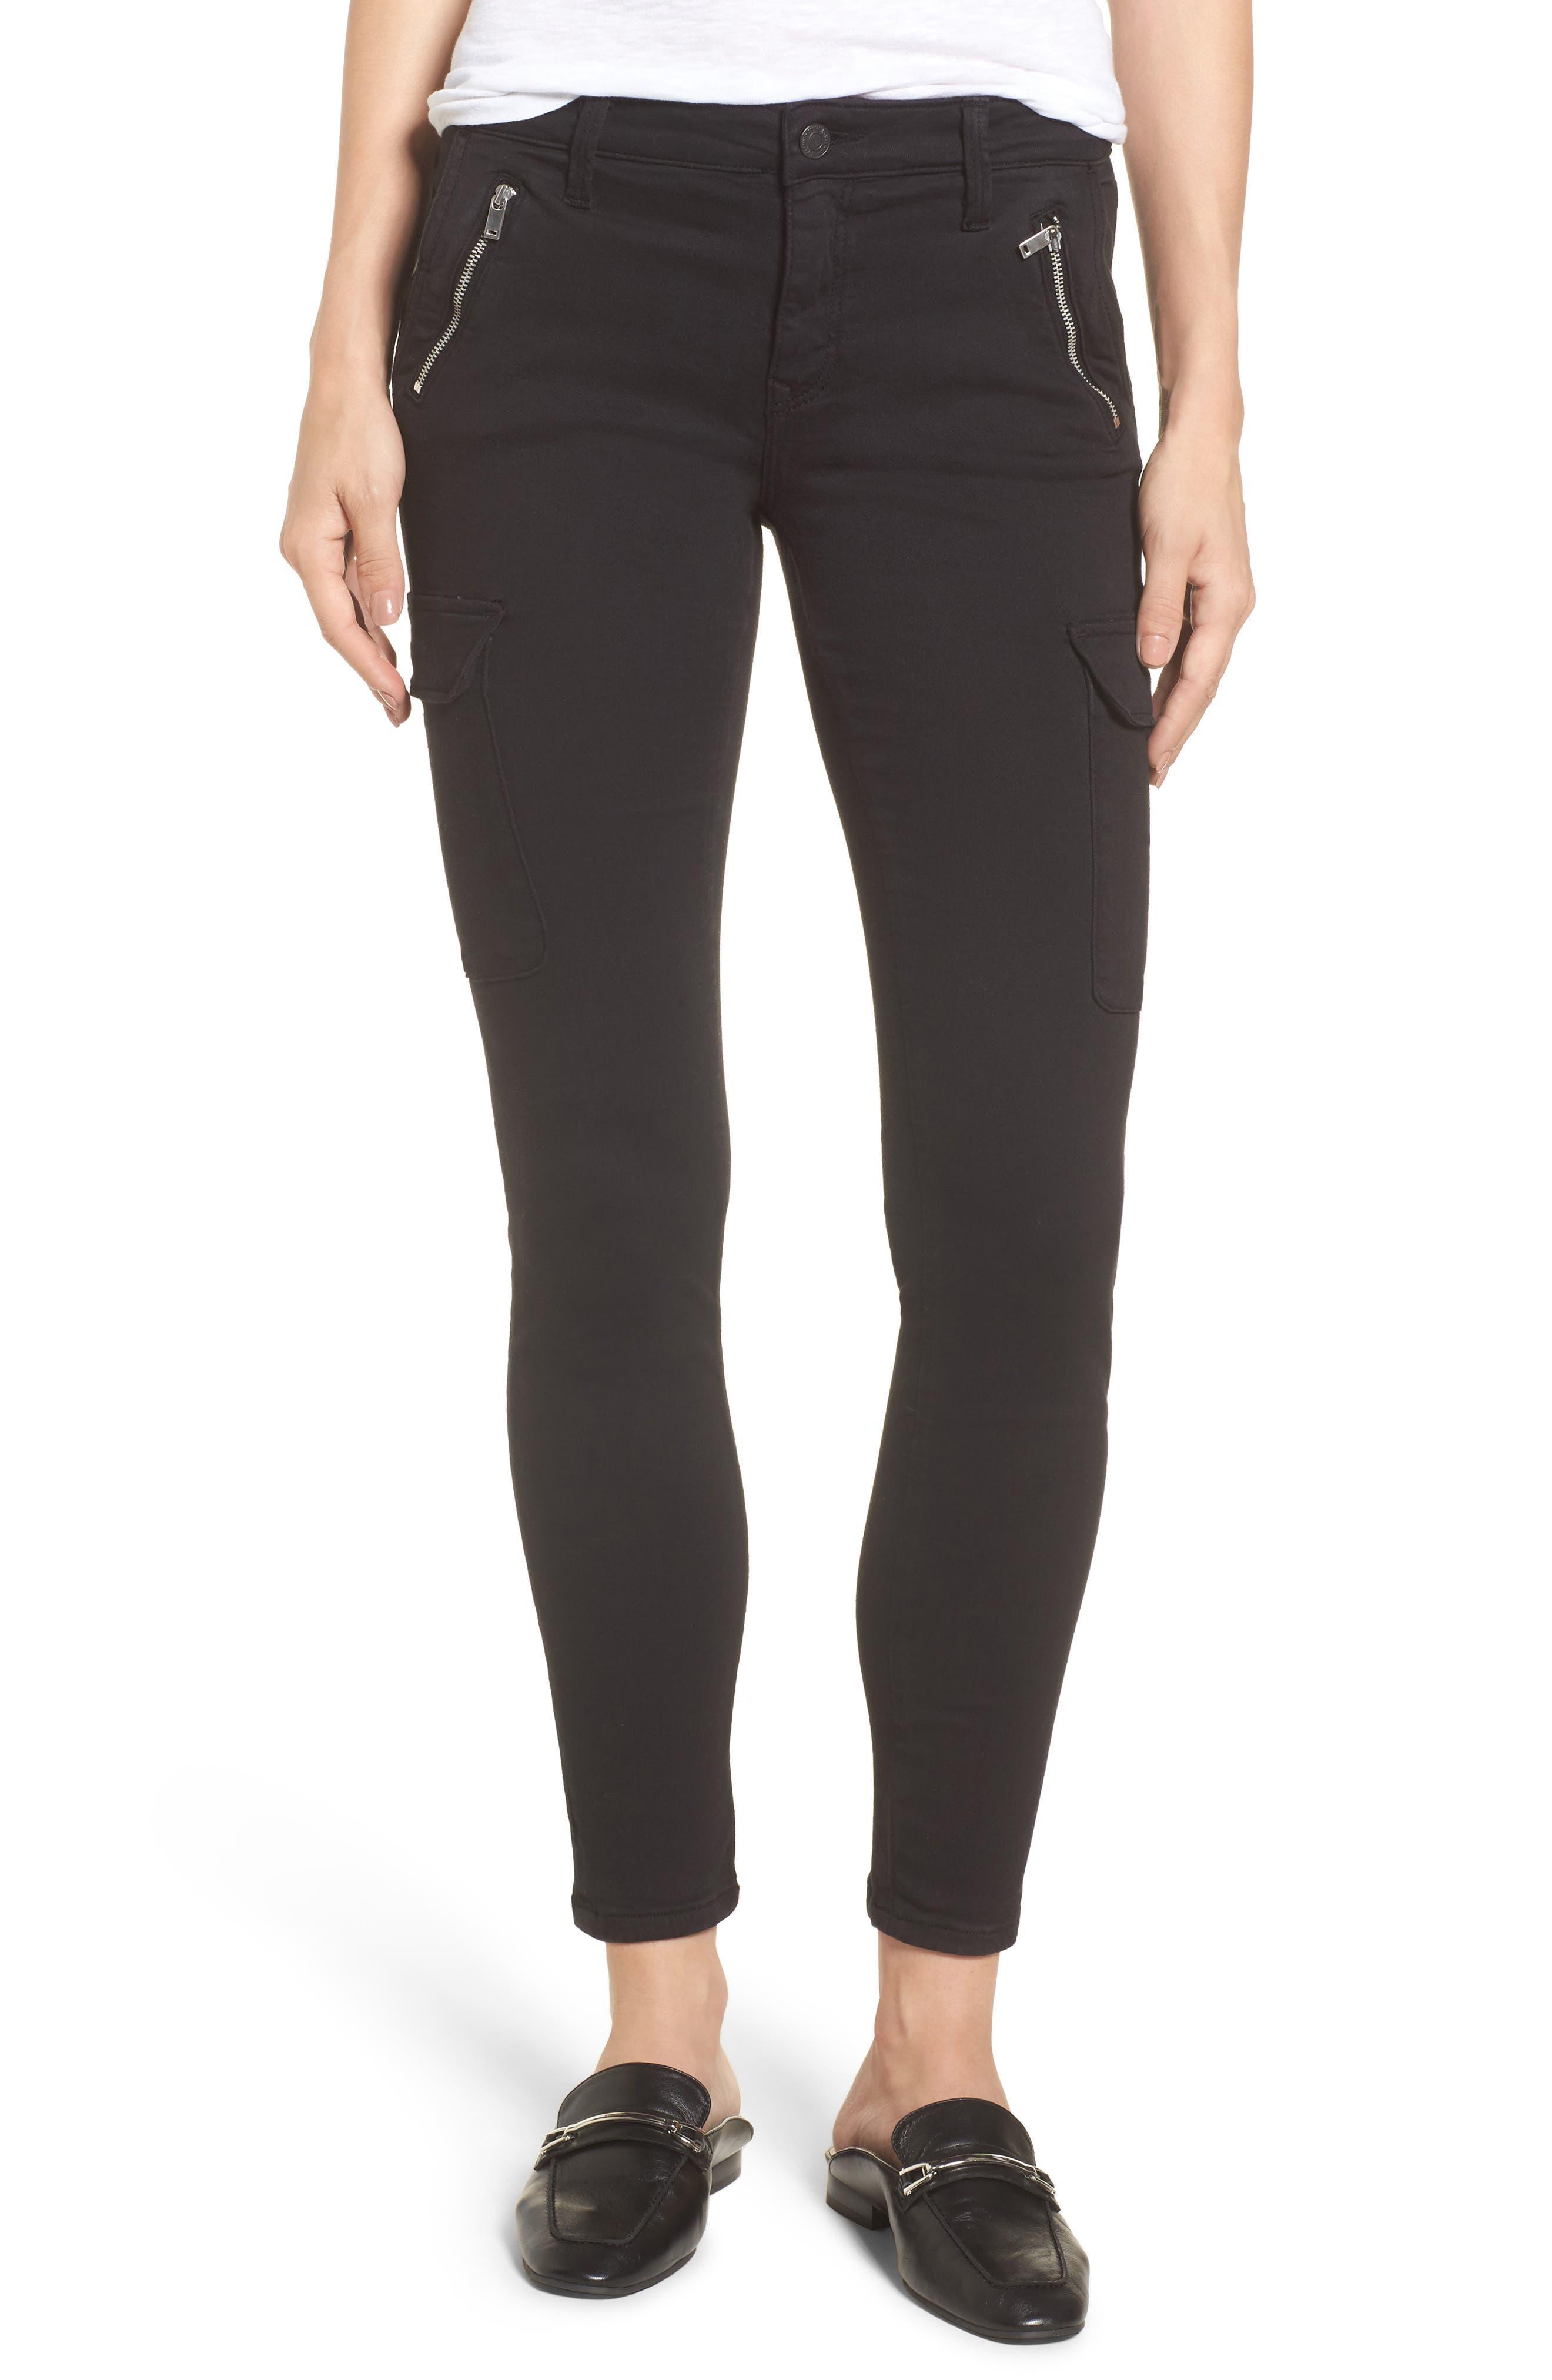 Juliette Skinny Cargo Pants,                         Main,                         color, Black Twill